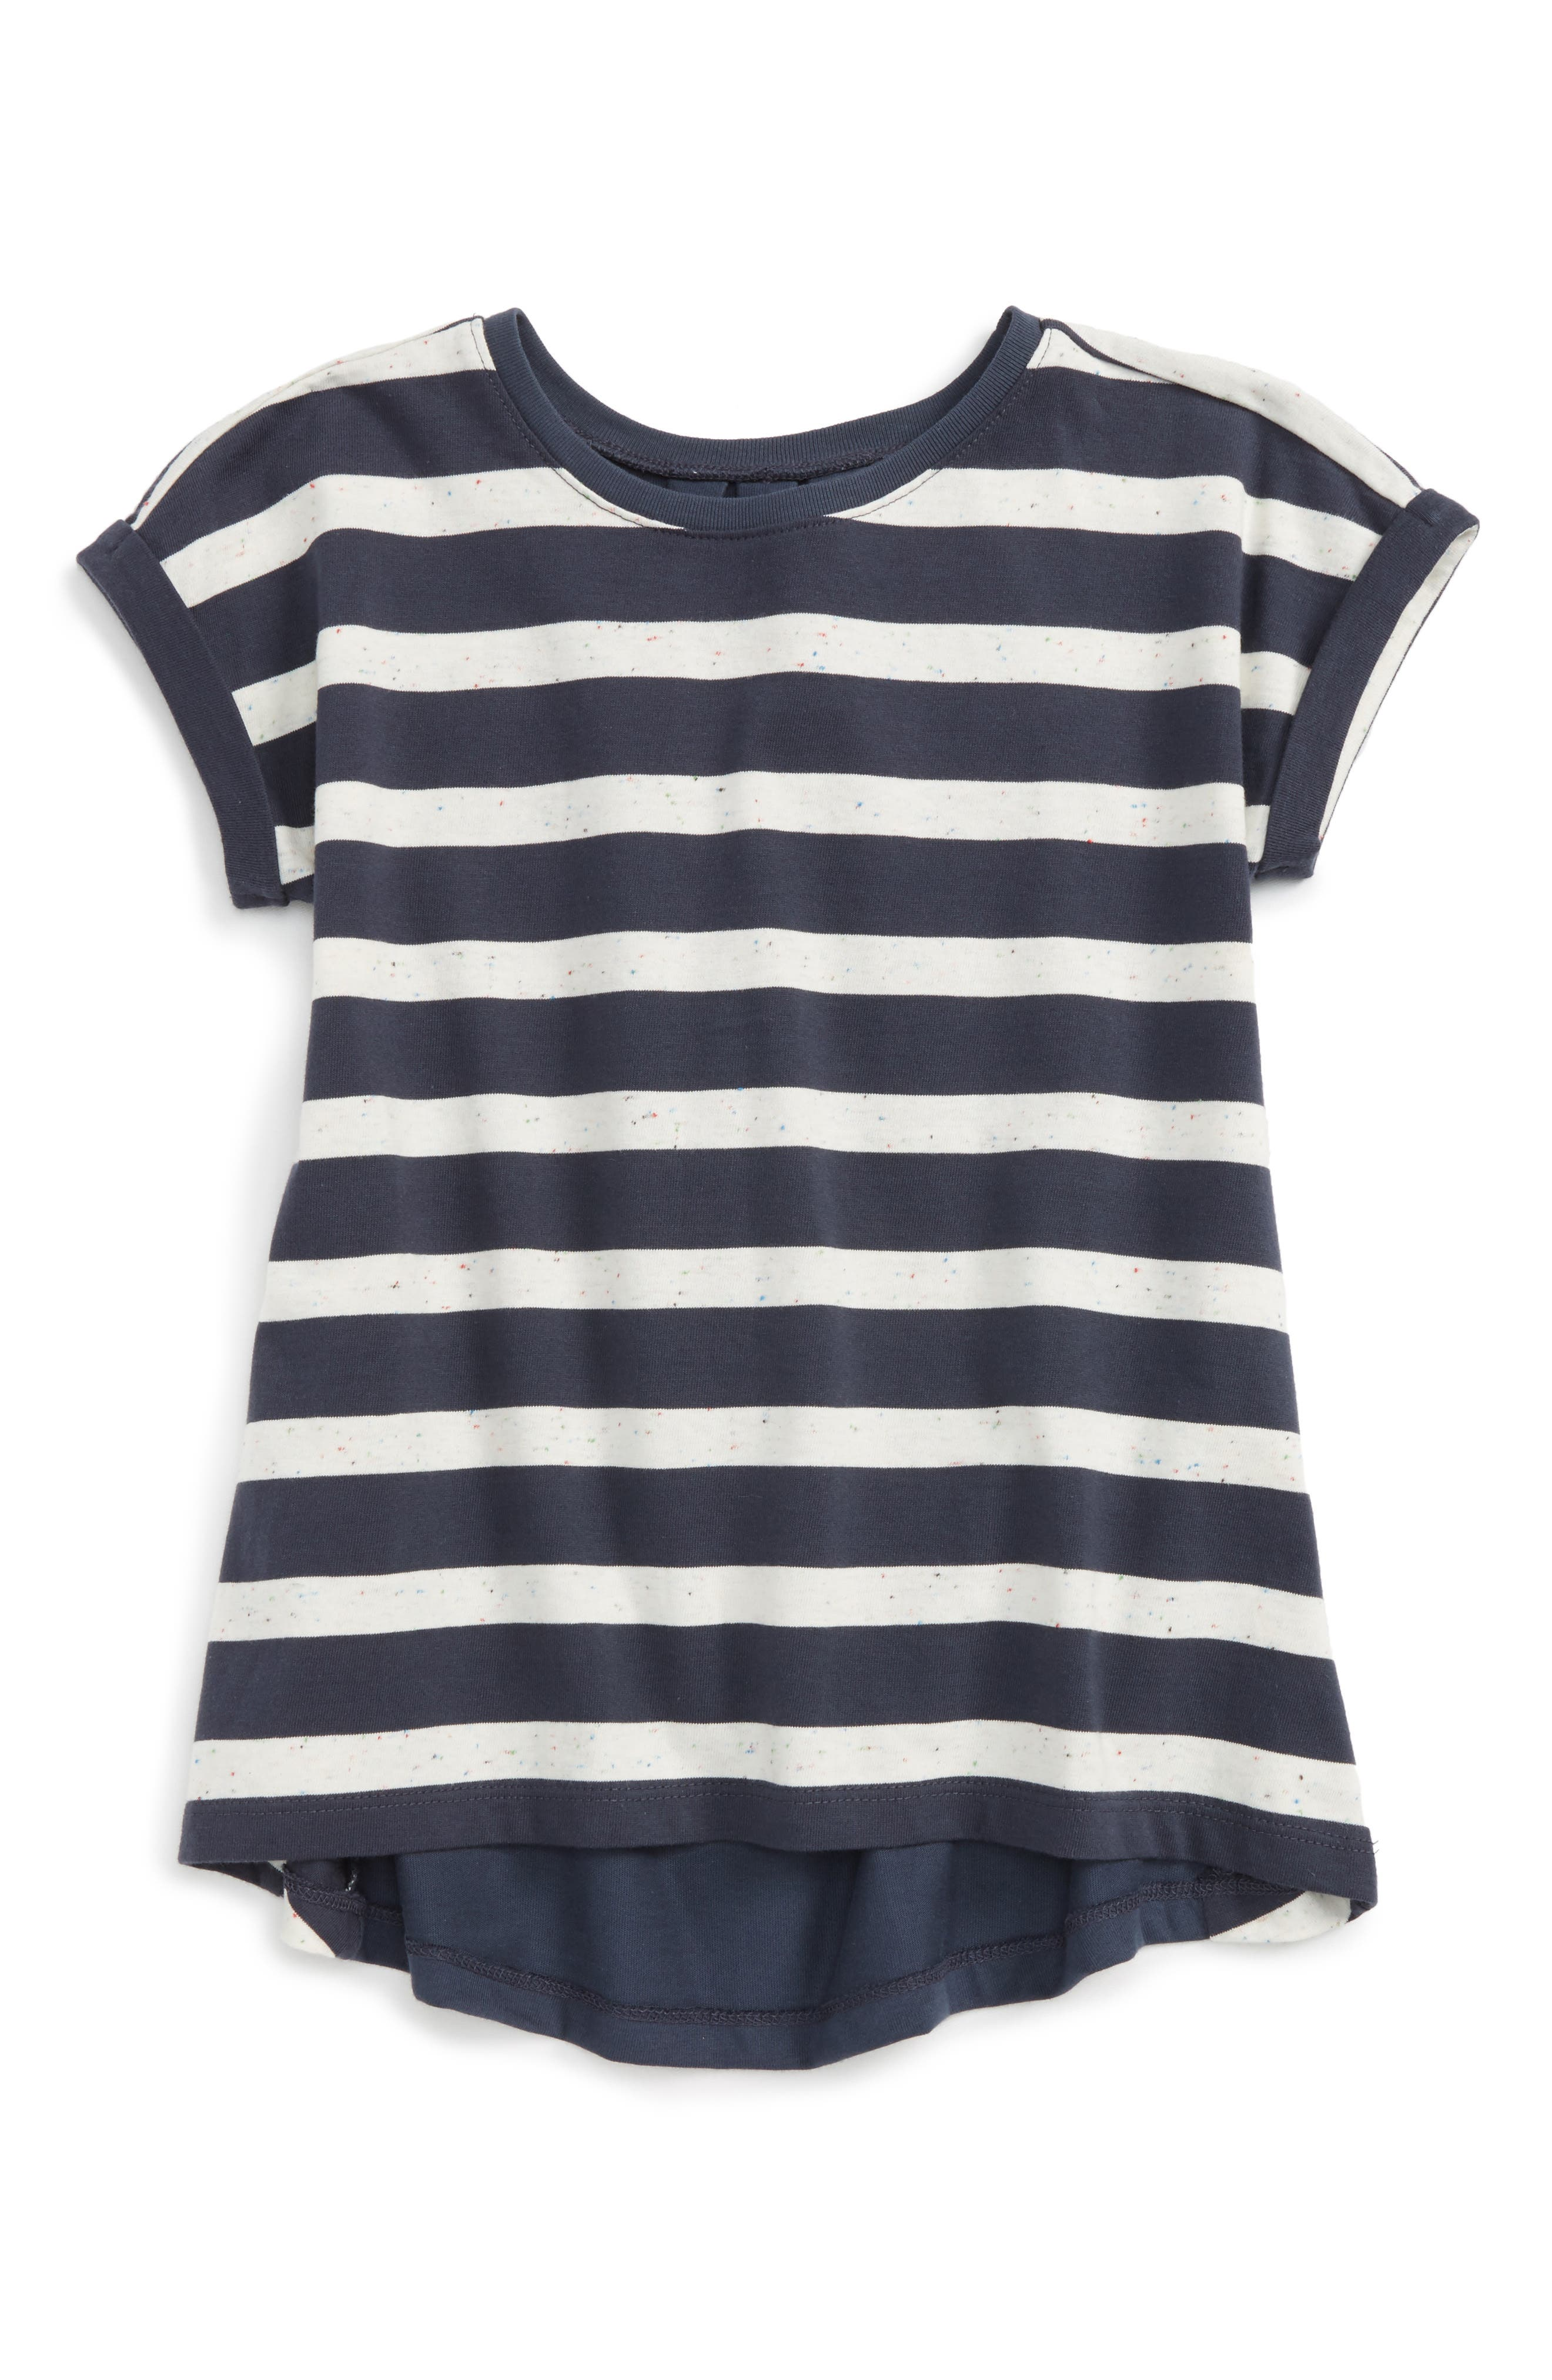 Main Image - Tea Collection Saorsa Pleated Top (Toddler Girls, Little Girls & Big Girls)